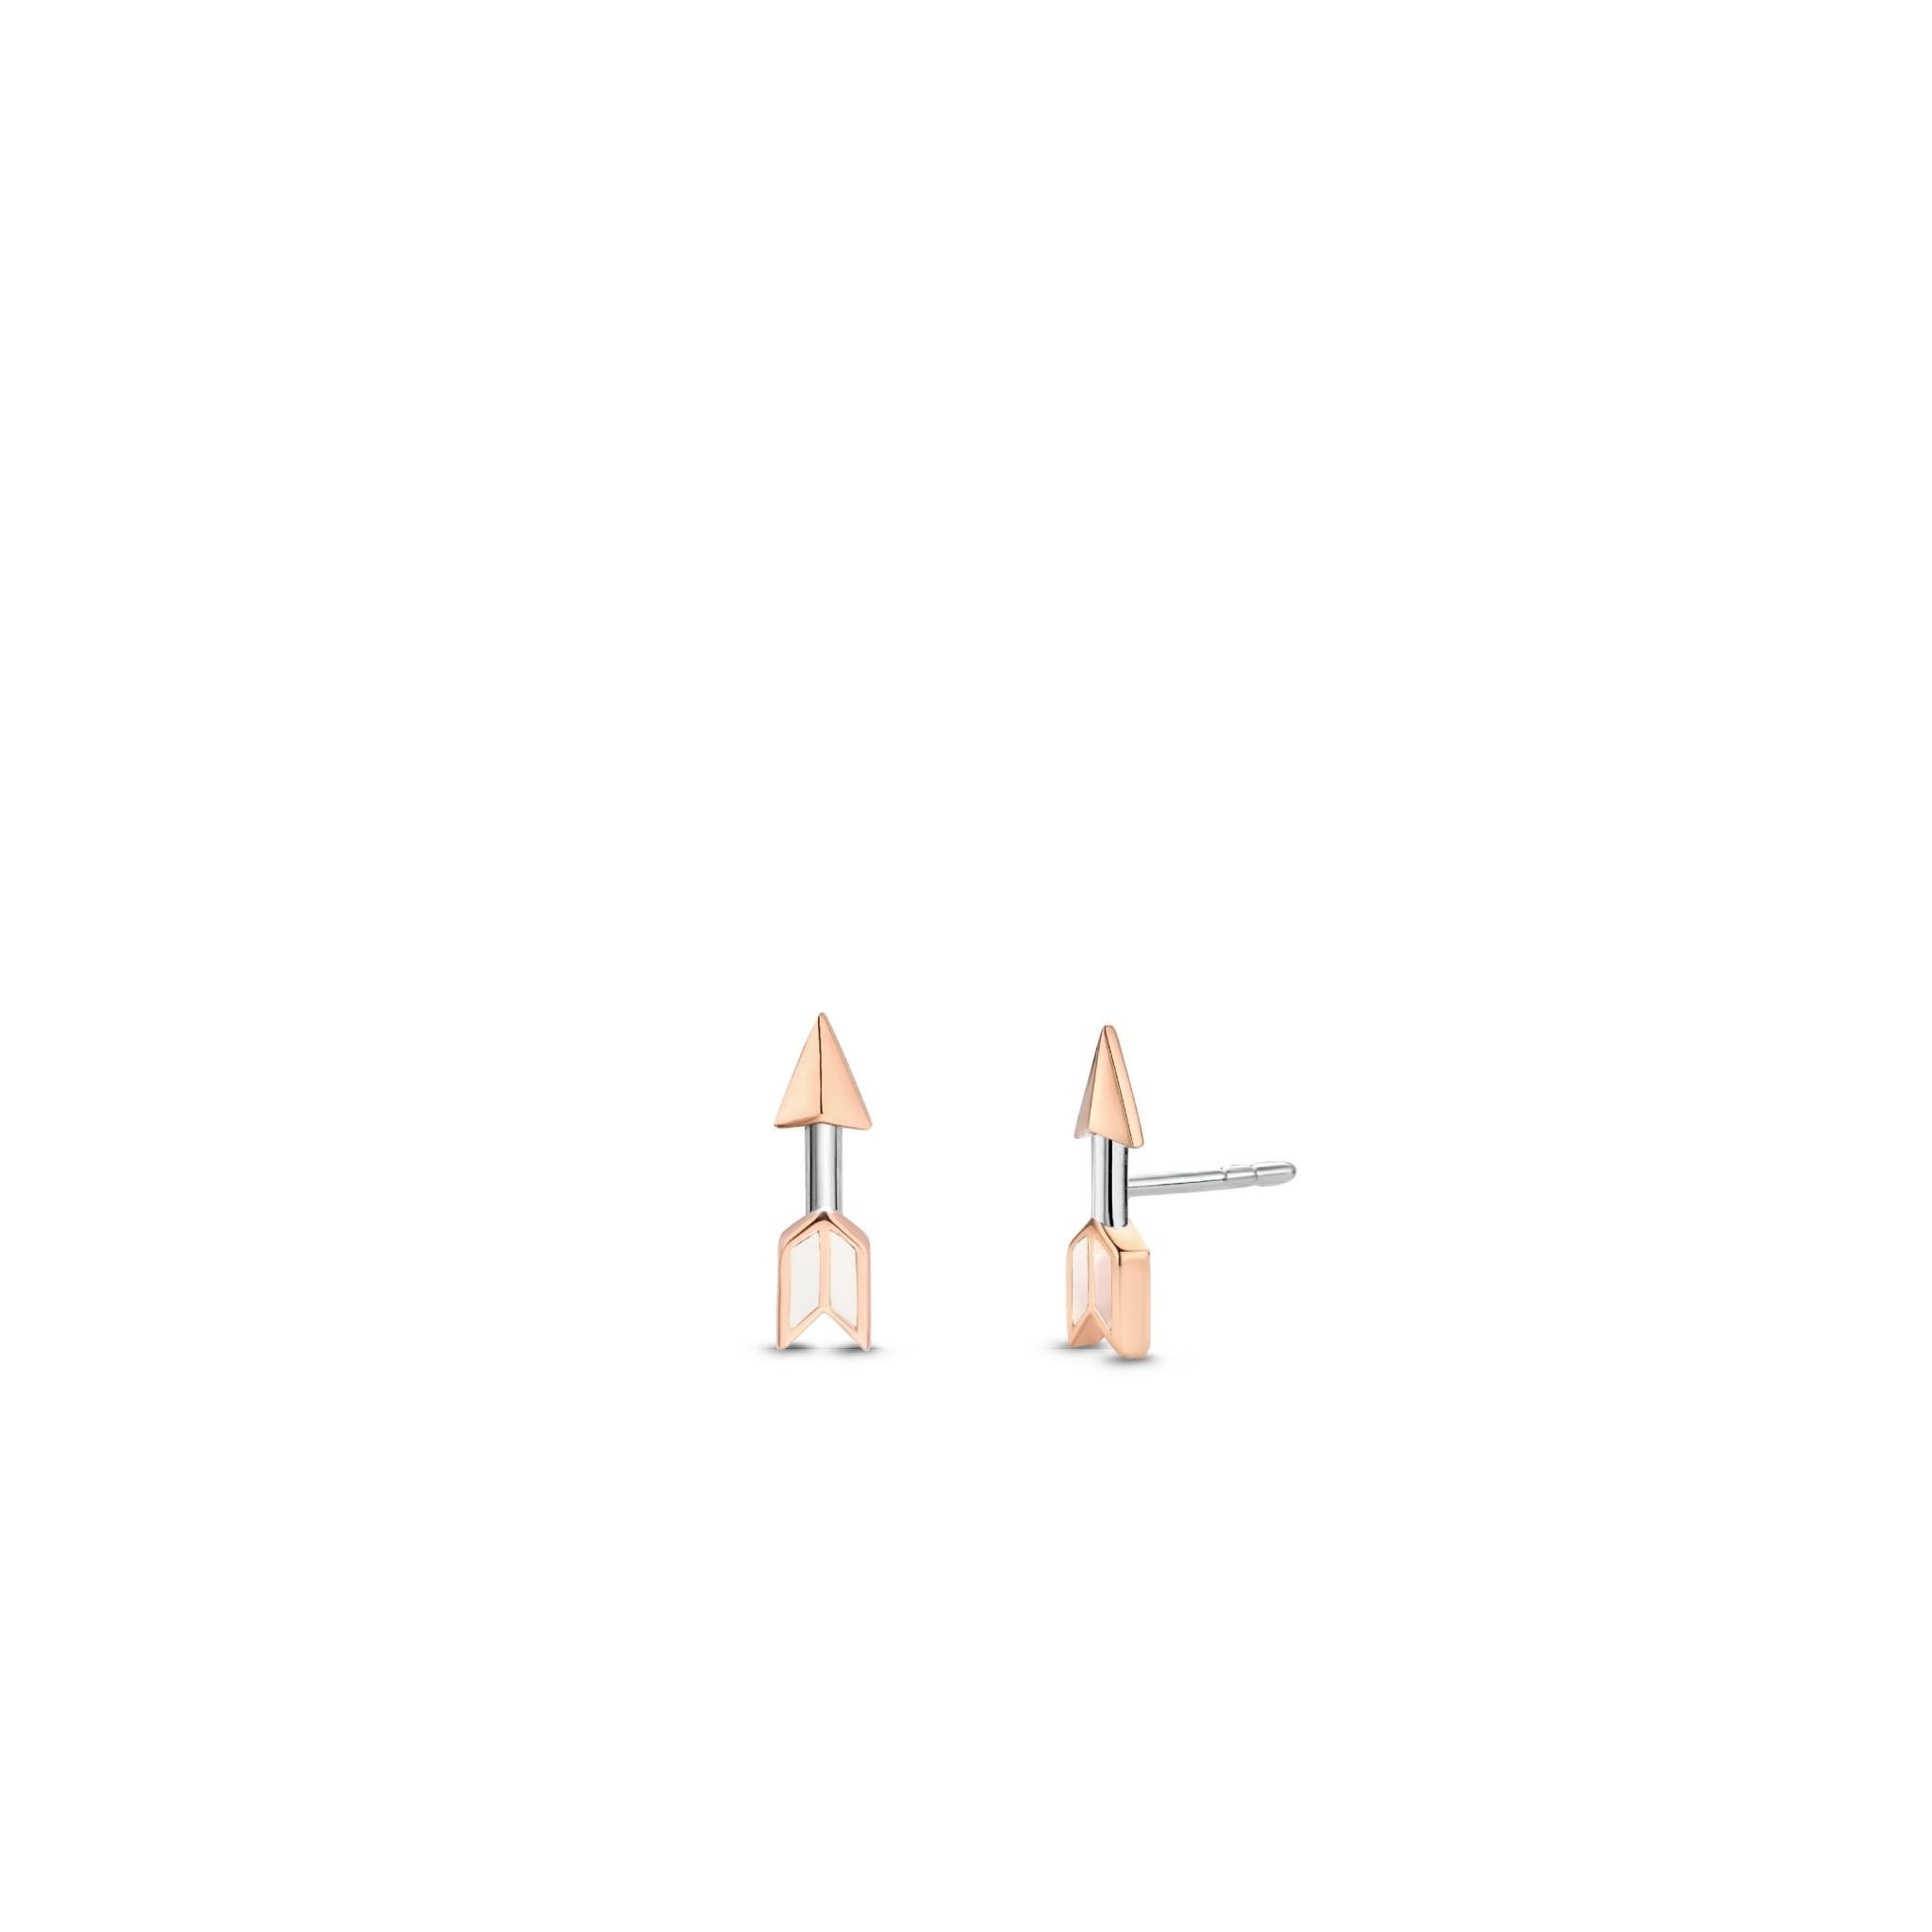 TI SENTO - Milano Earrings 7820MW-1